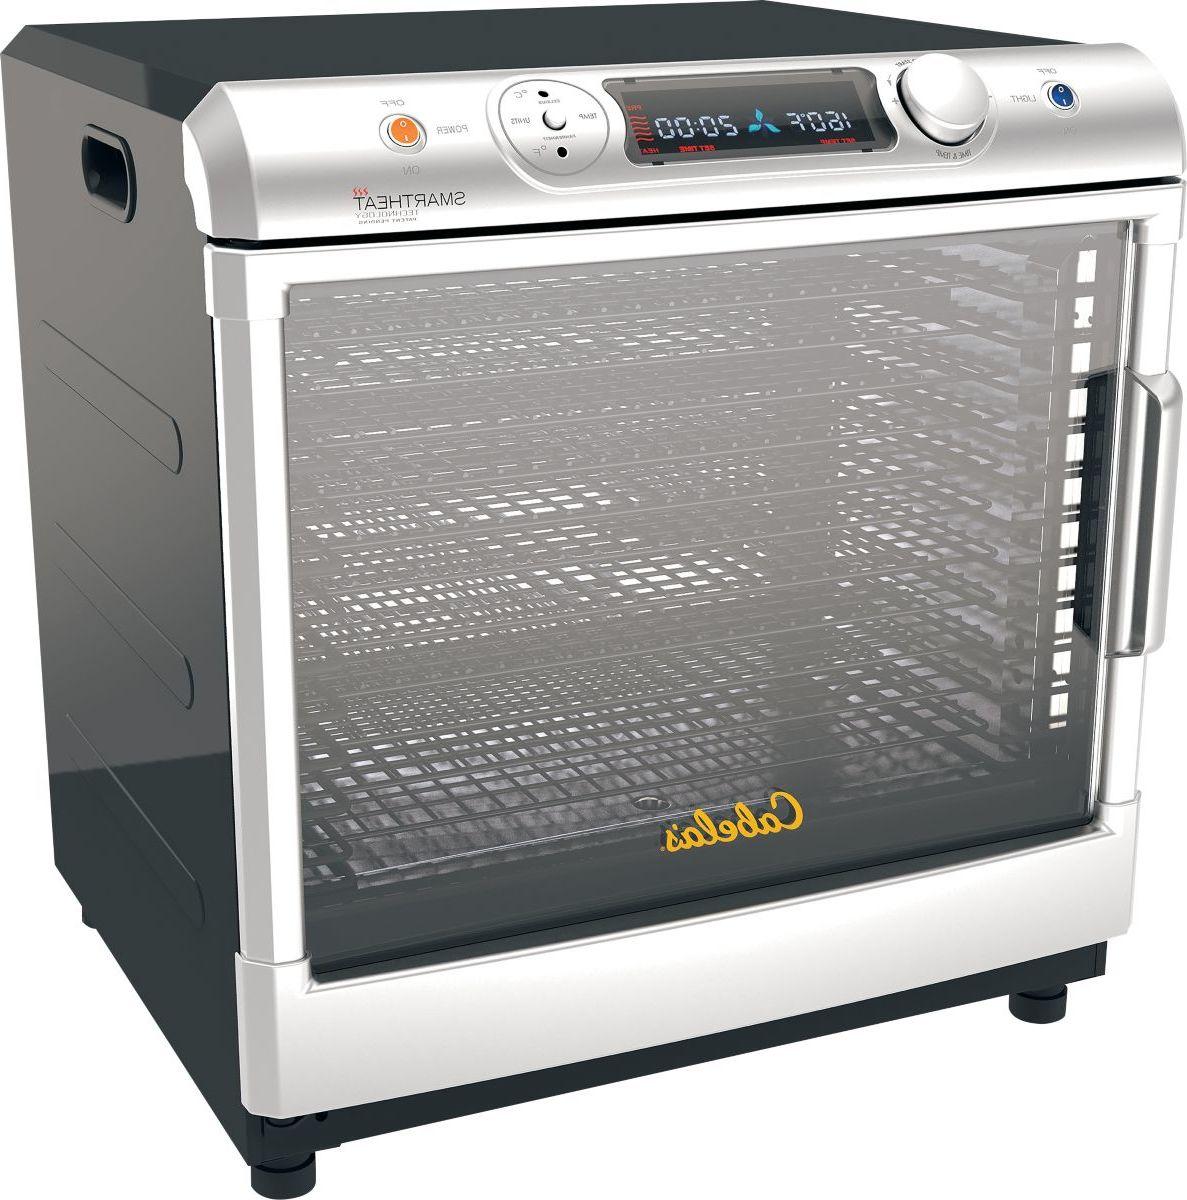 Cabela's 80-Liter Commercial-Grade Food Dehydrator